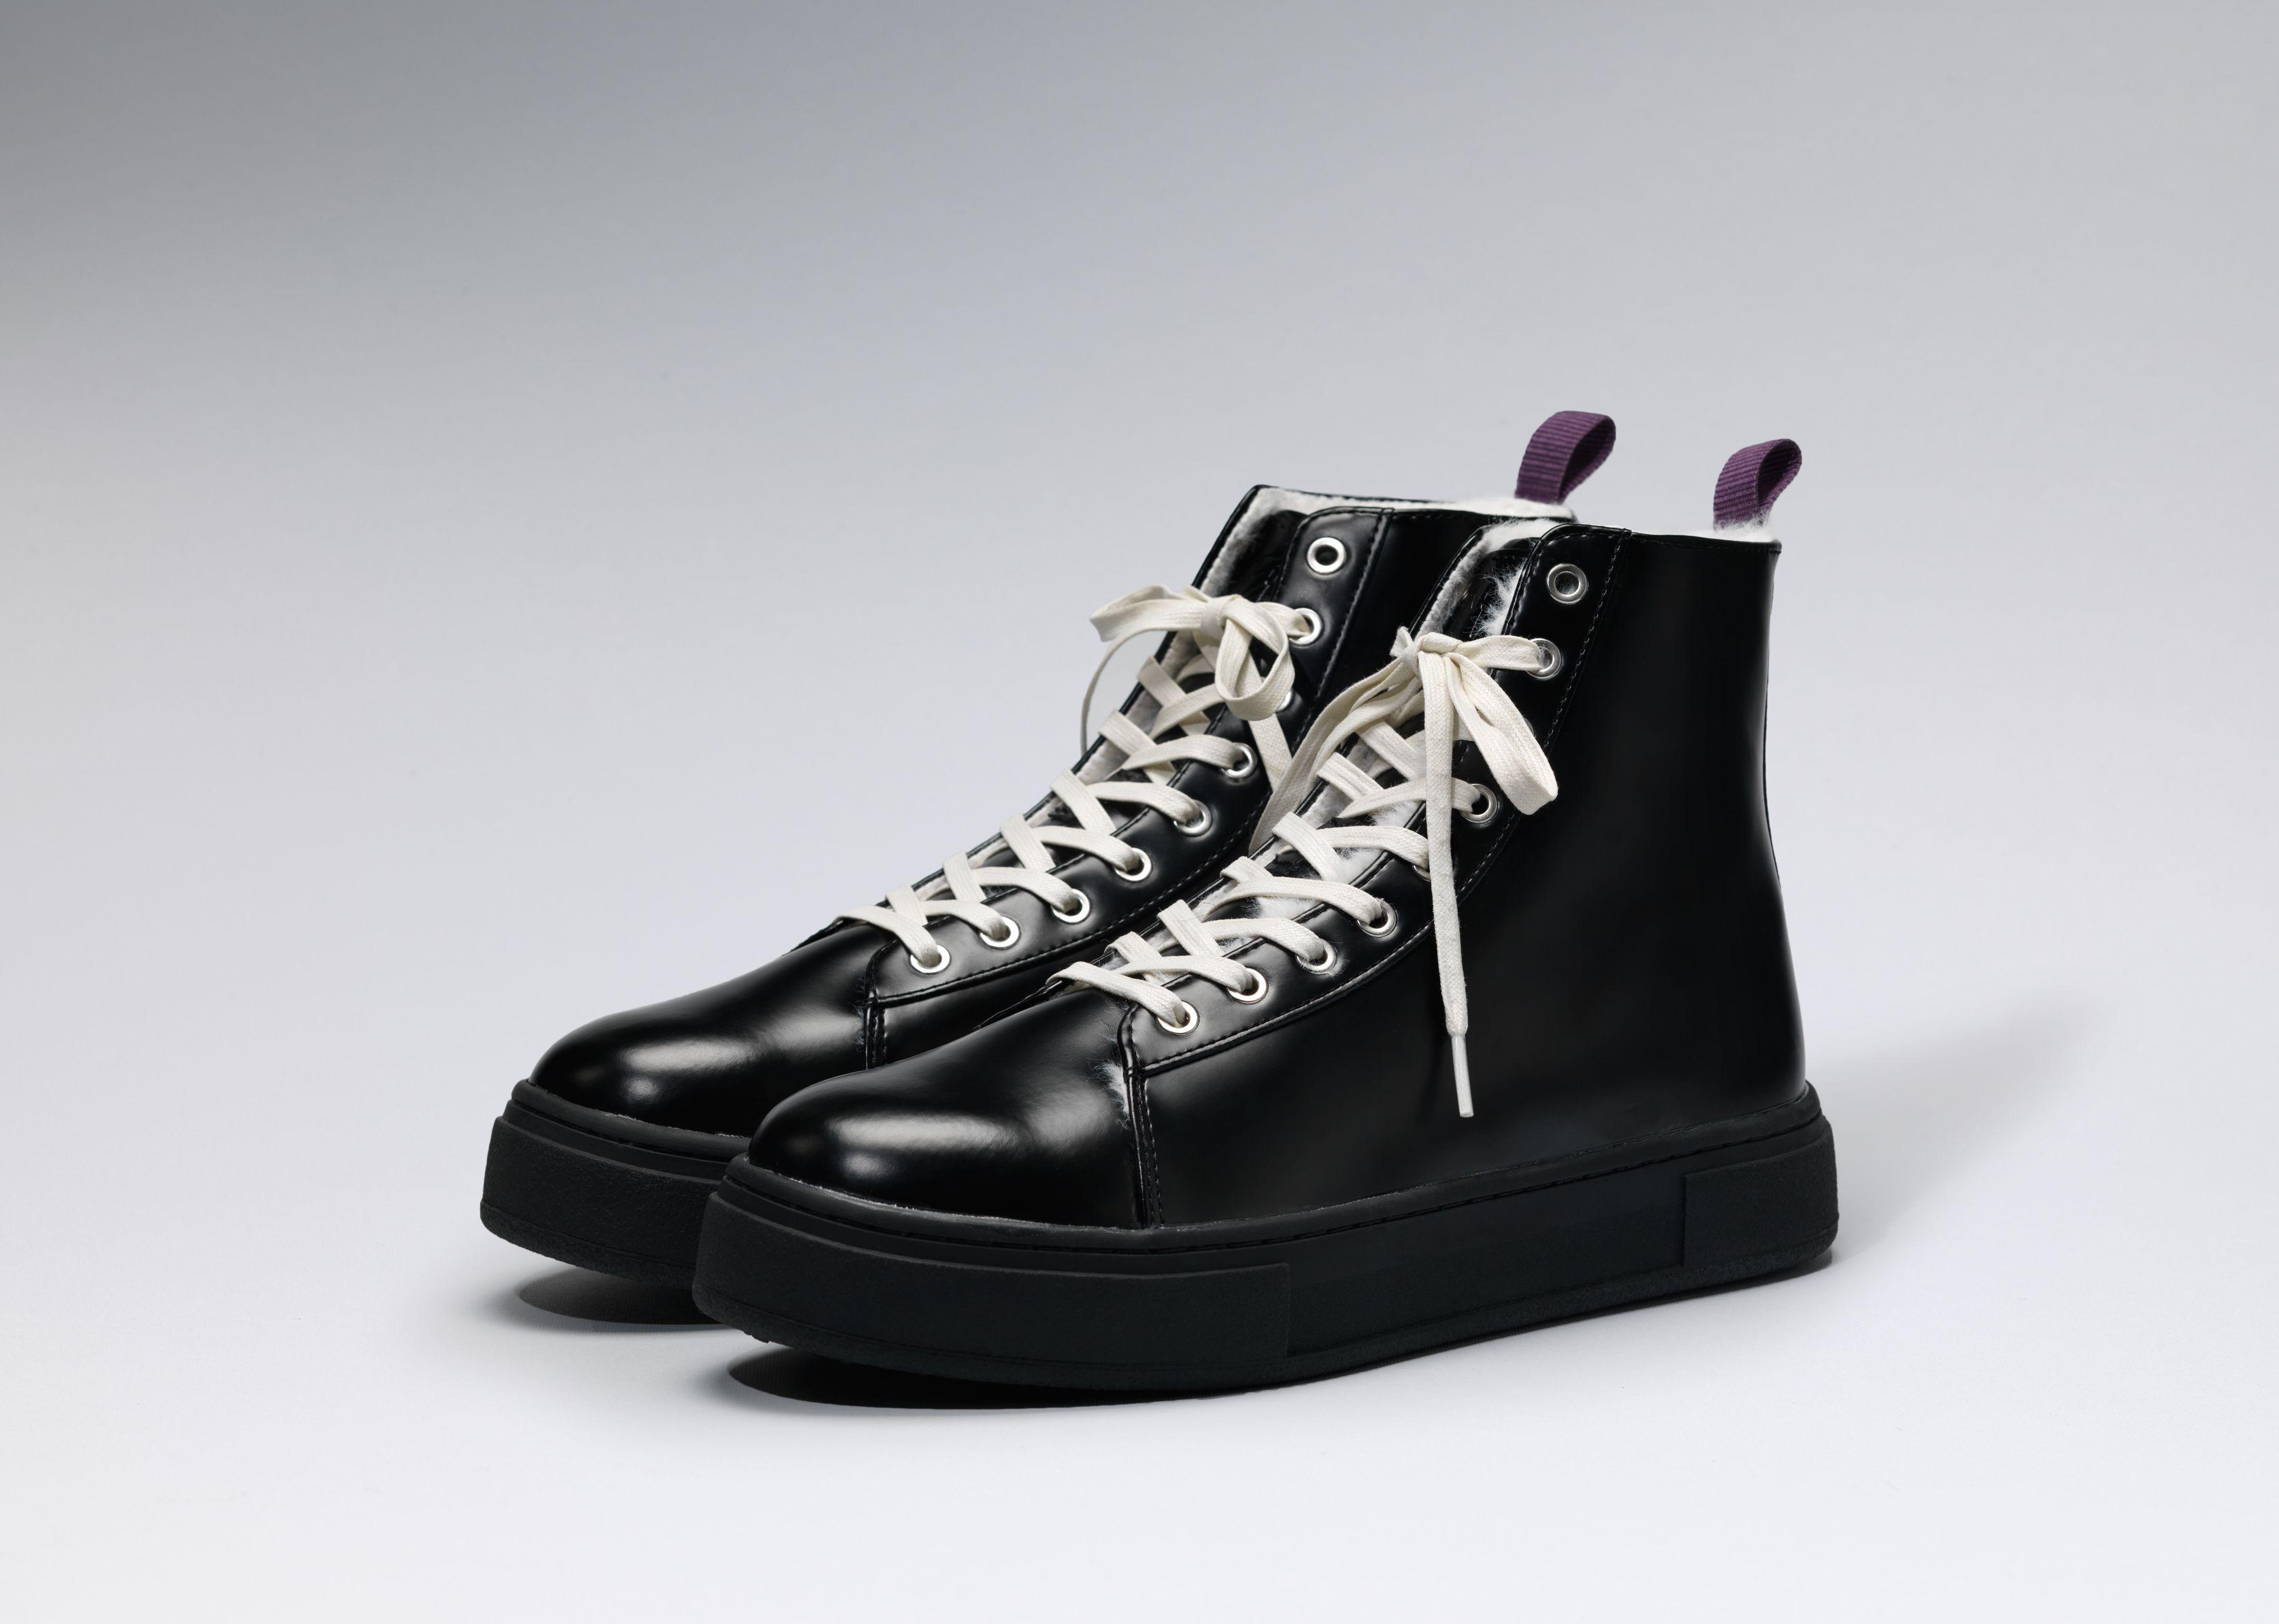 Eytys Kibo Leather in Arctic All Black